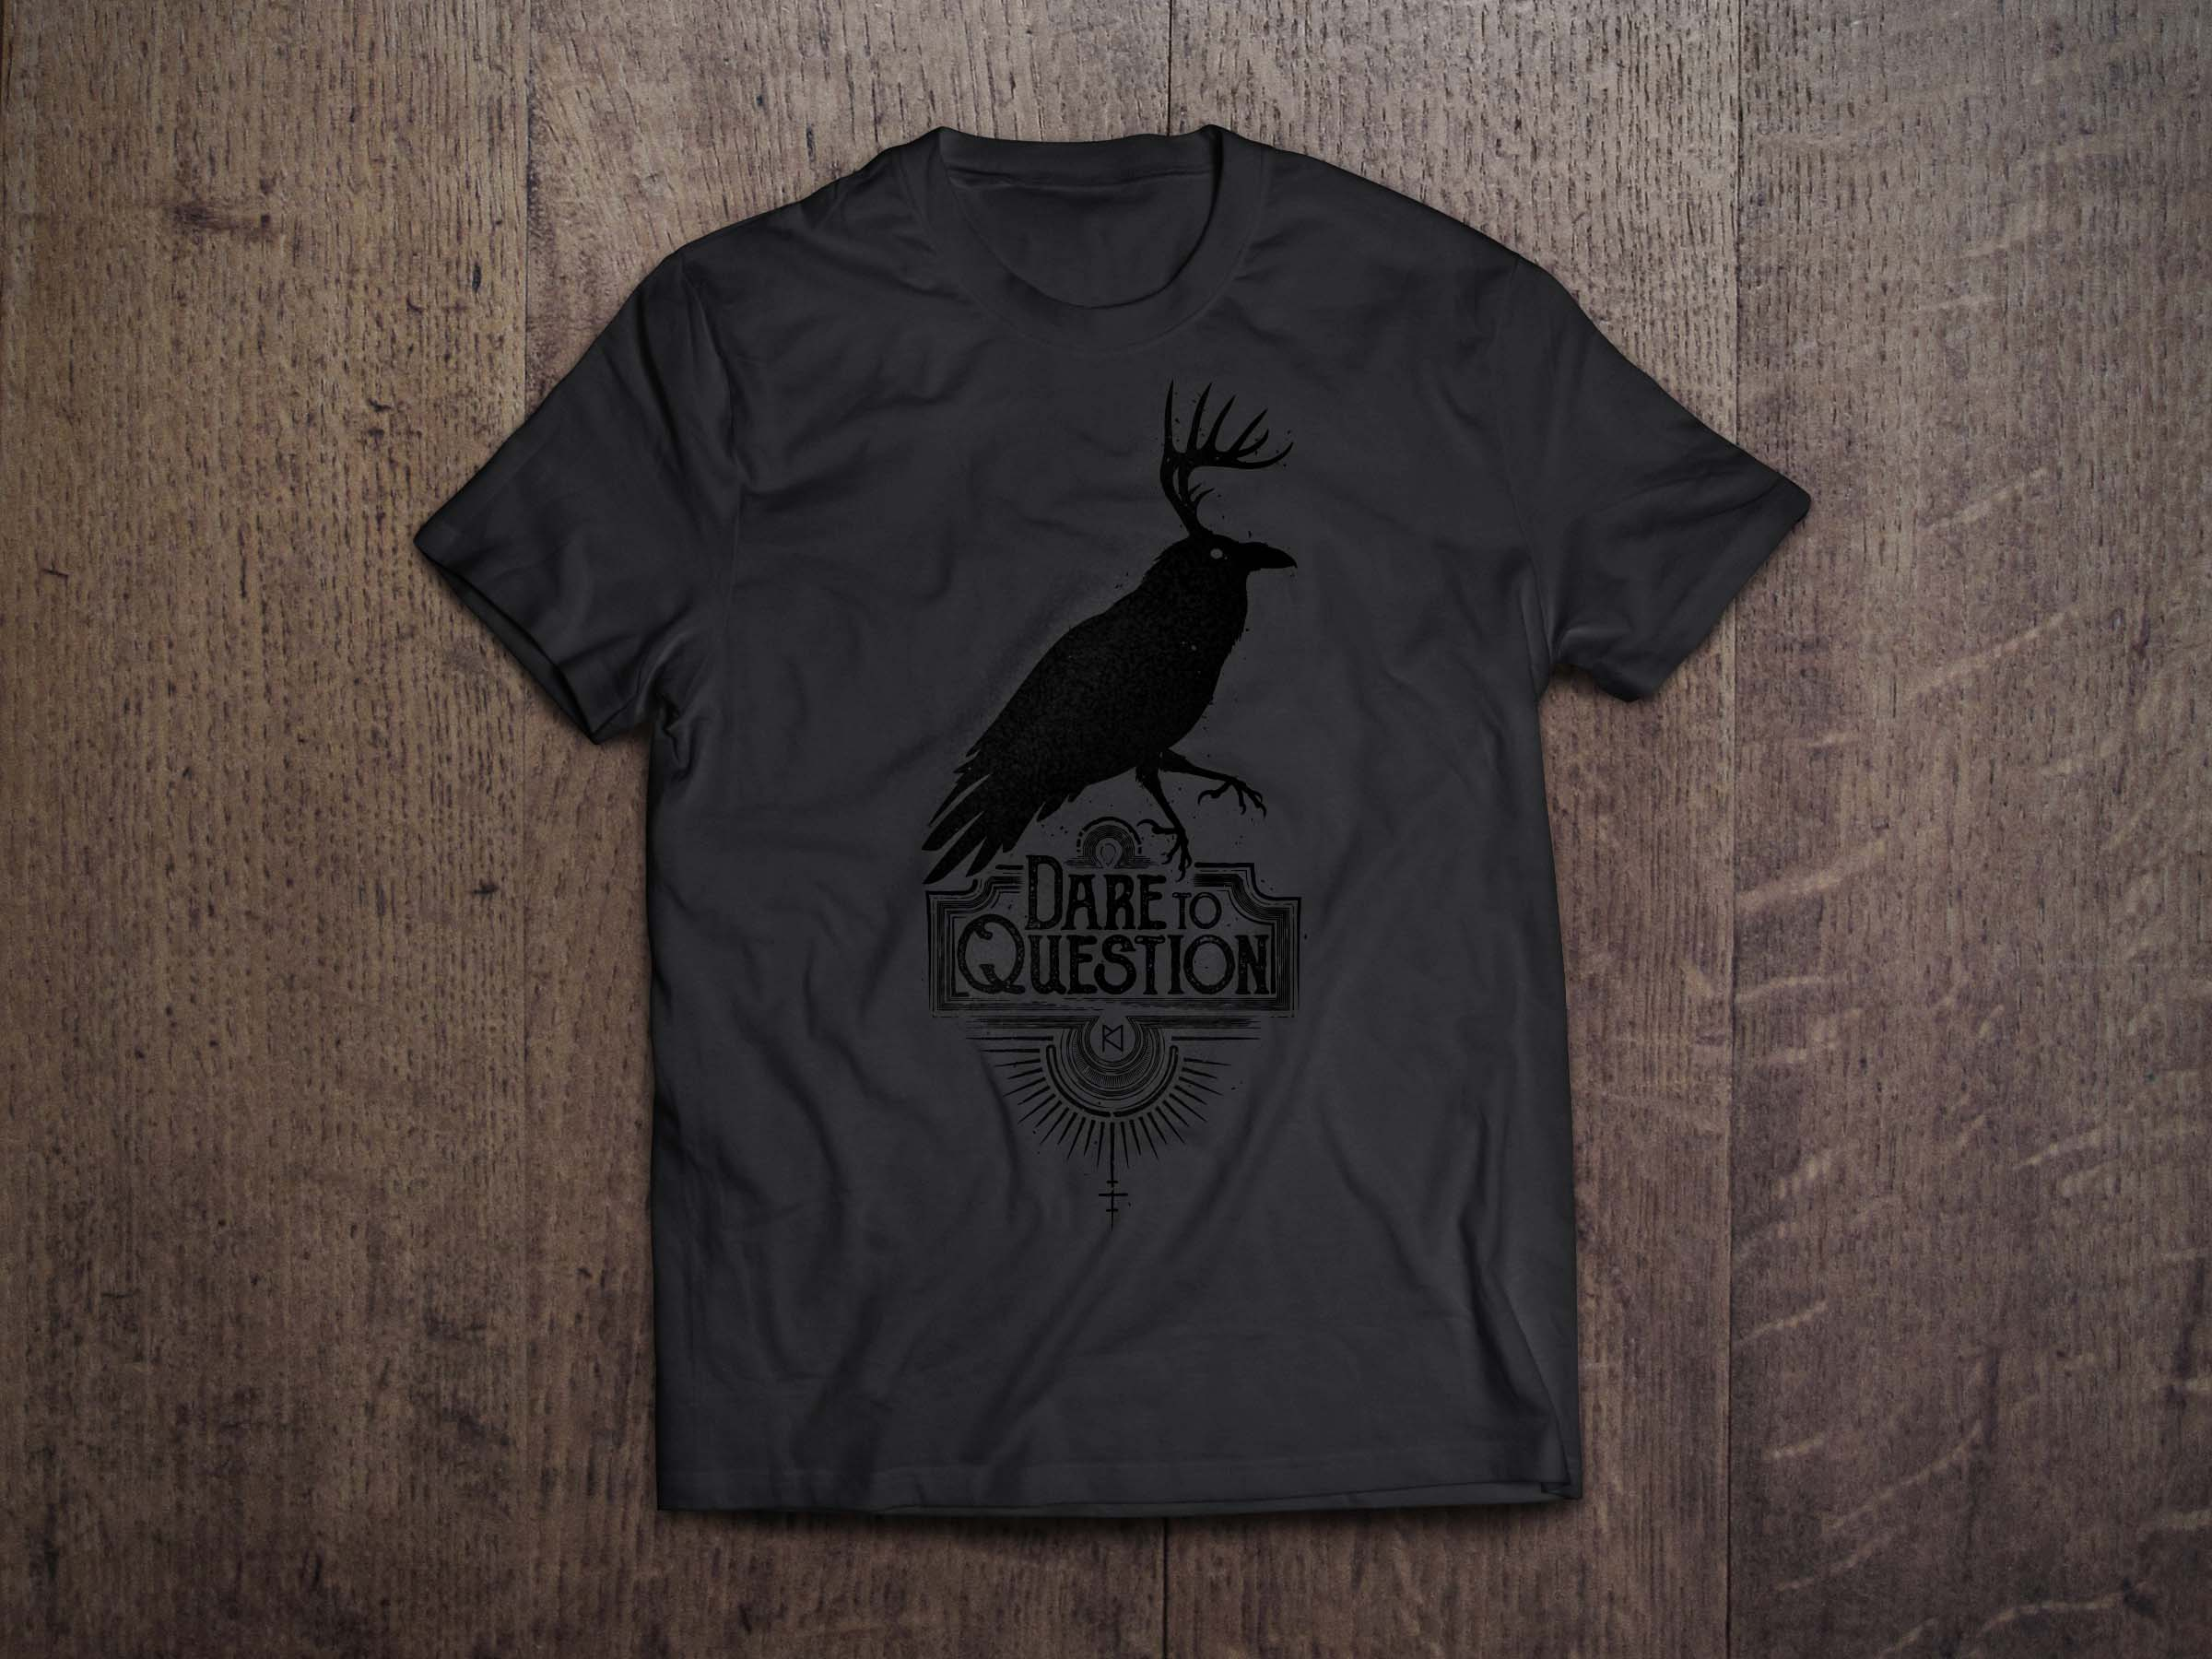 DTQ Black on Black T-Shirt MockUp Wood BG_web.jpg